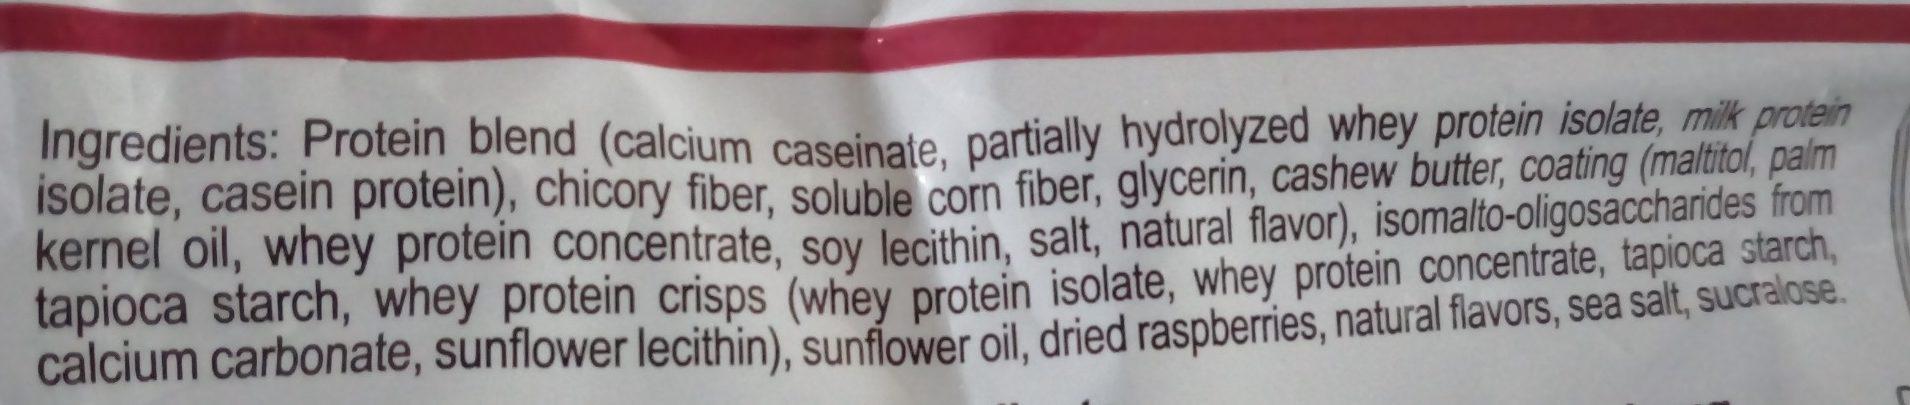 Barre protéinée framboise chocolat blanc - Ingredients